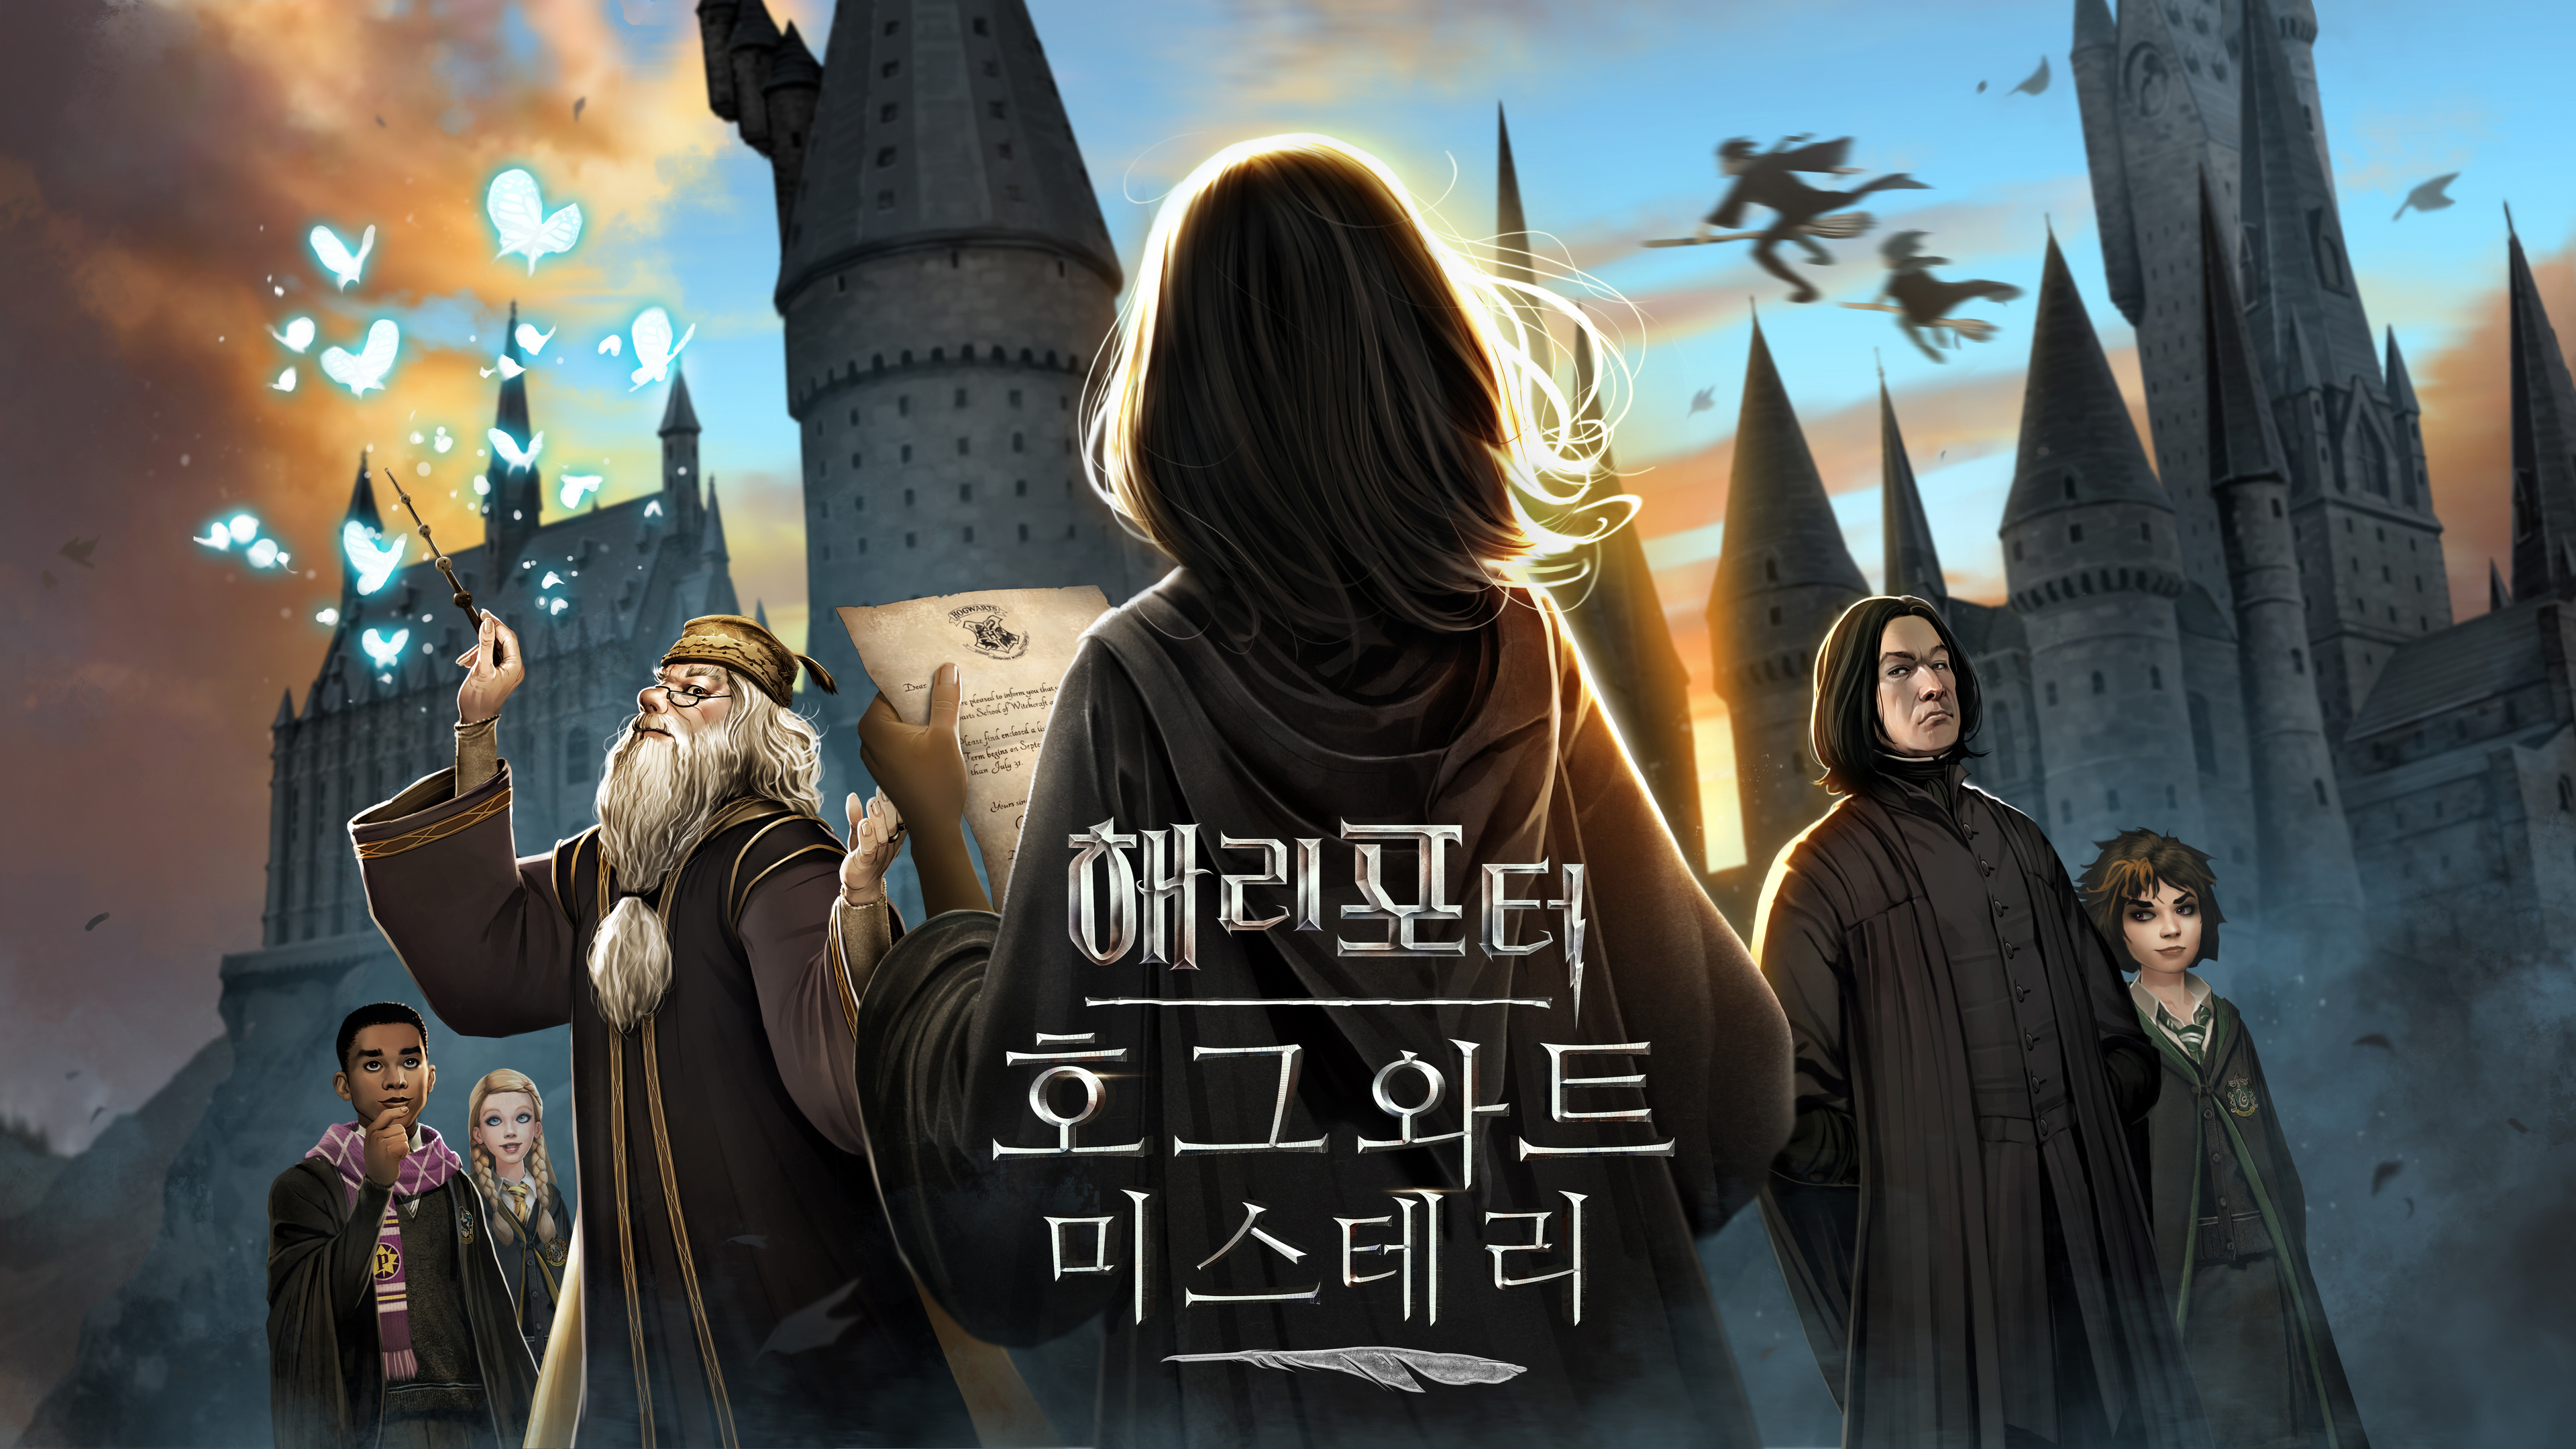 Wallpaper 4k Harry Potter Hogwarts Mystery Korea Key Art 10k 10k